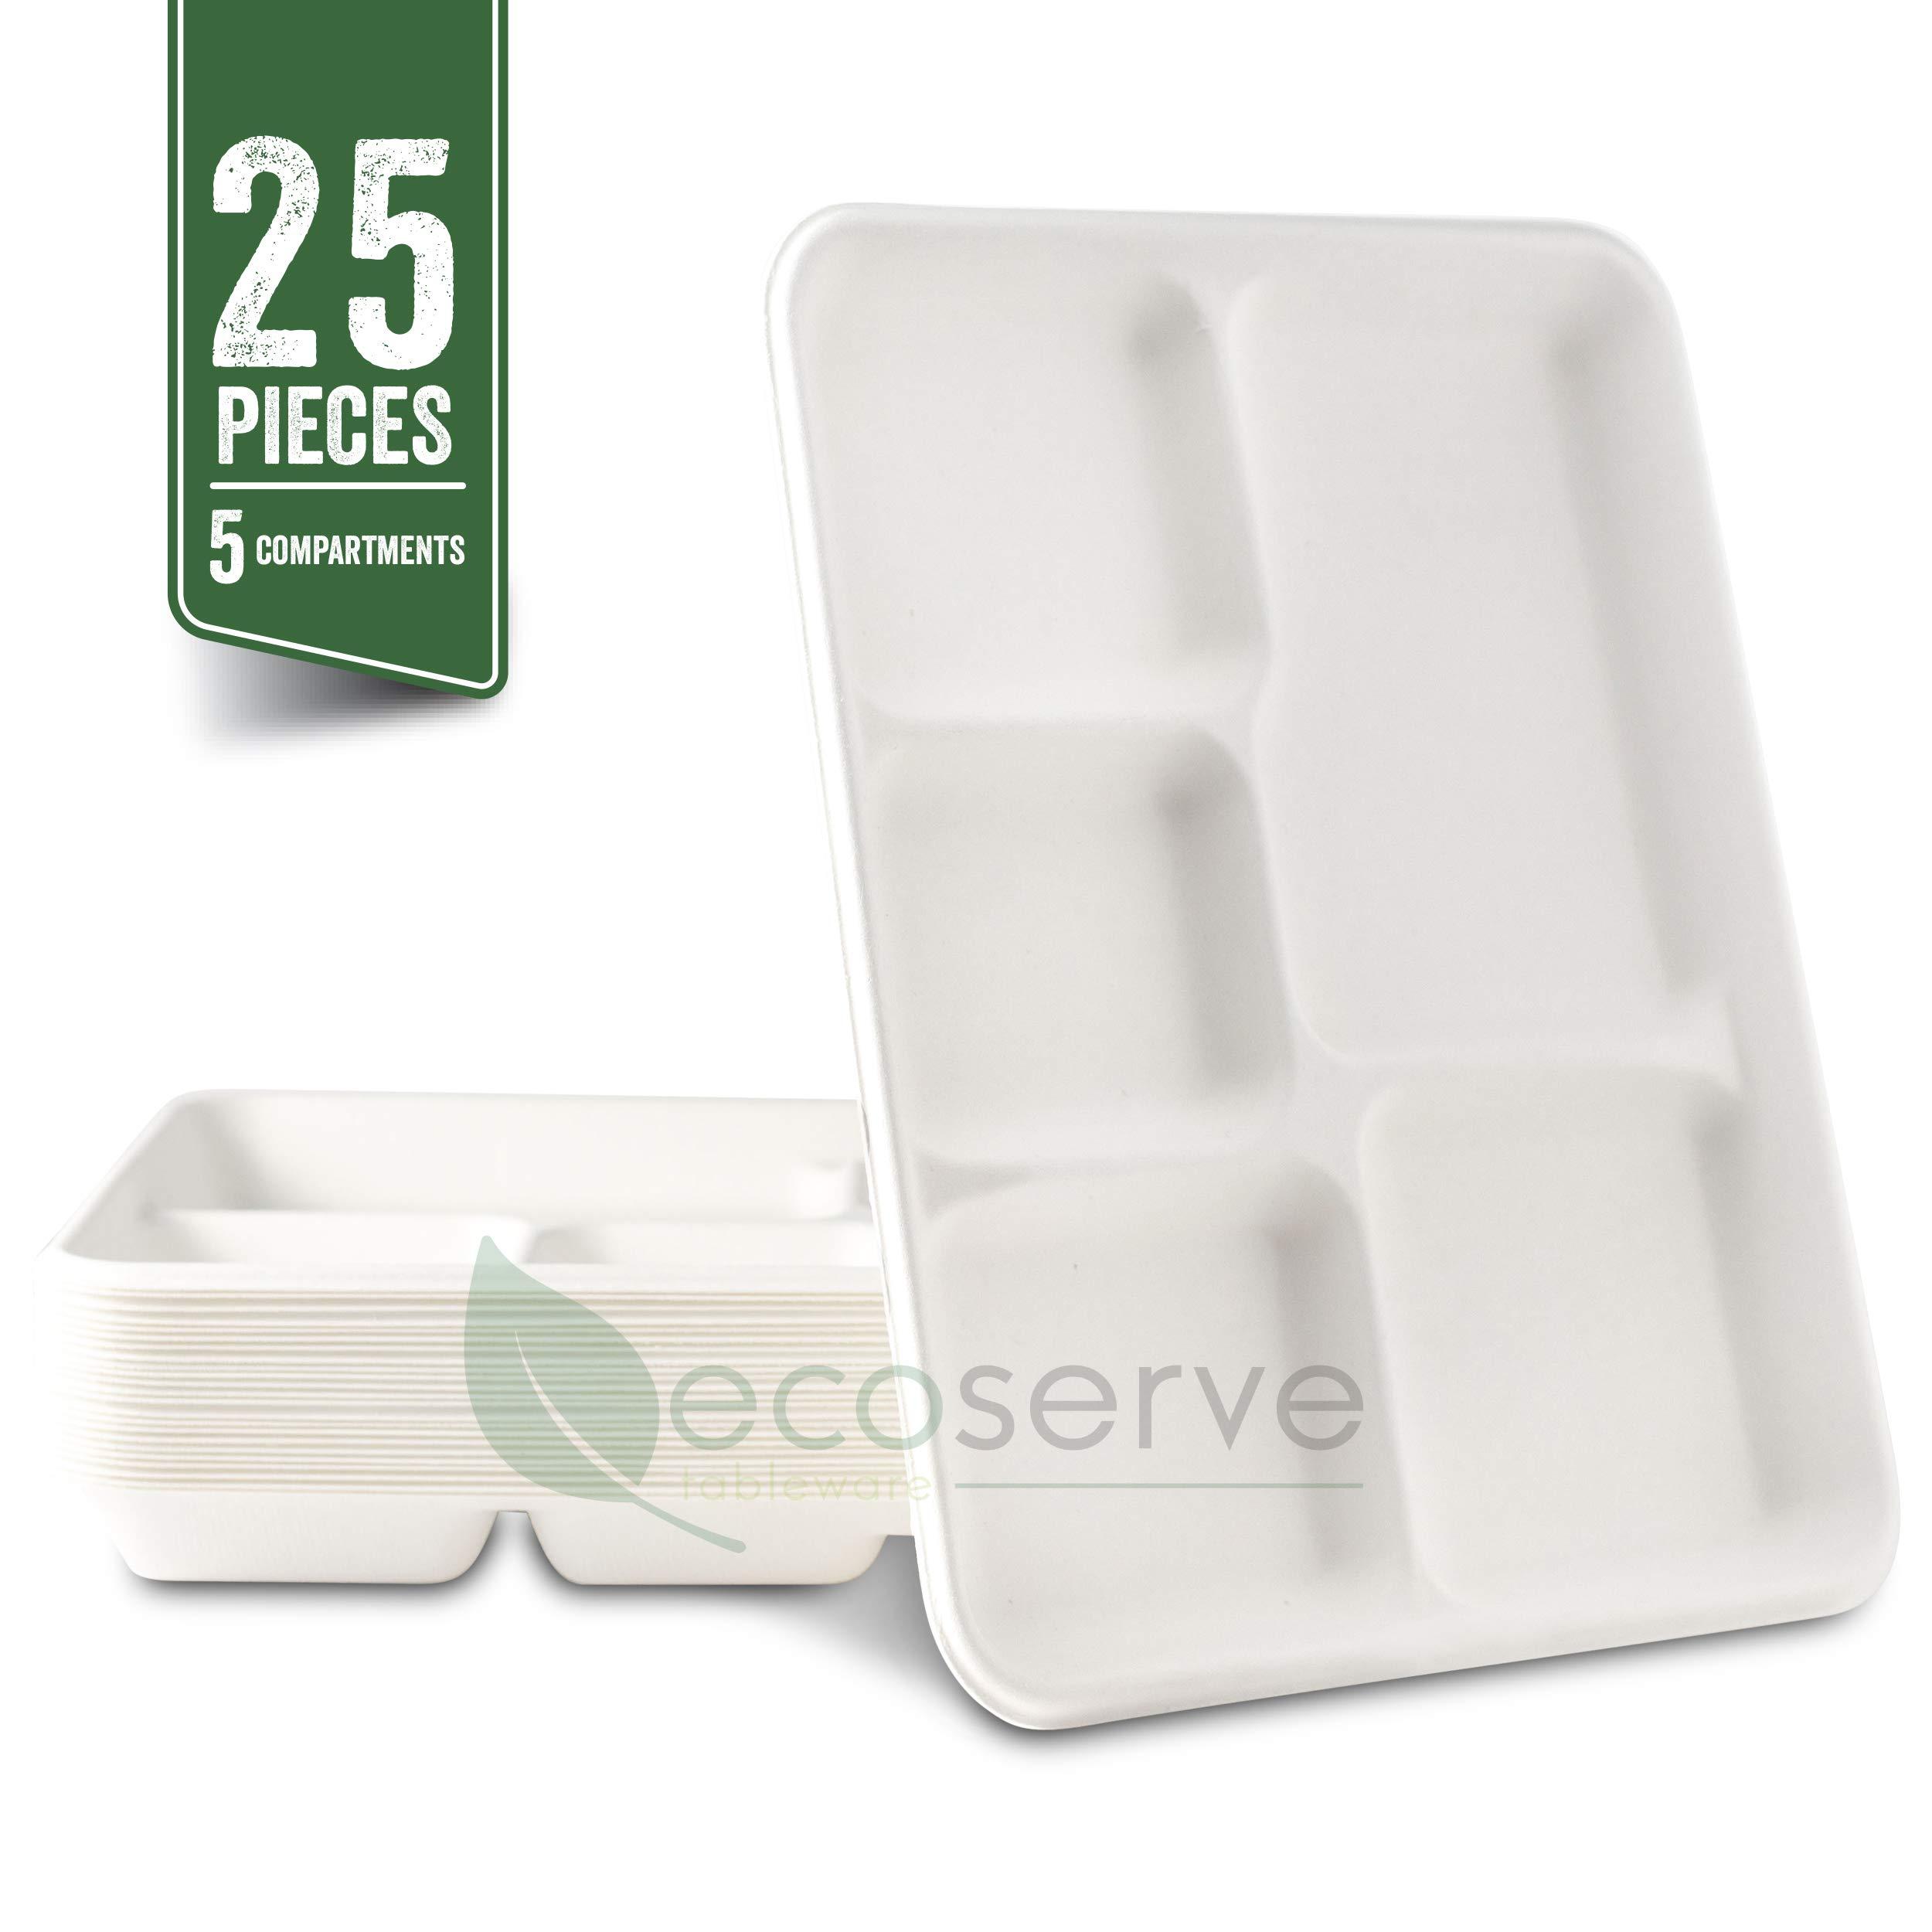 Platos de papel desechables de 5 compartimentos, bandejas ...